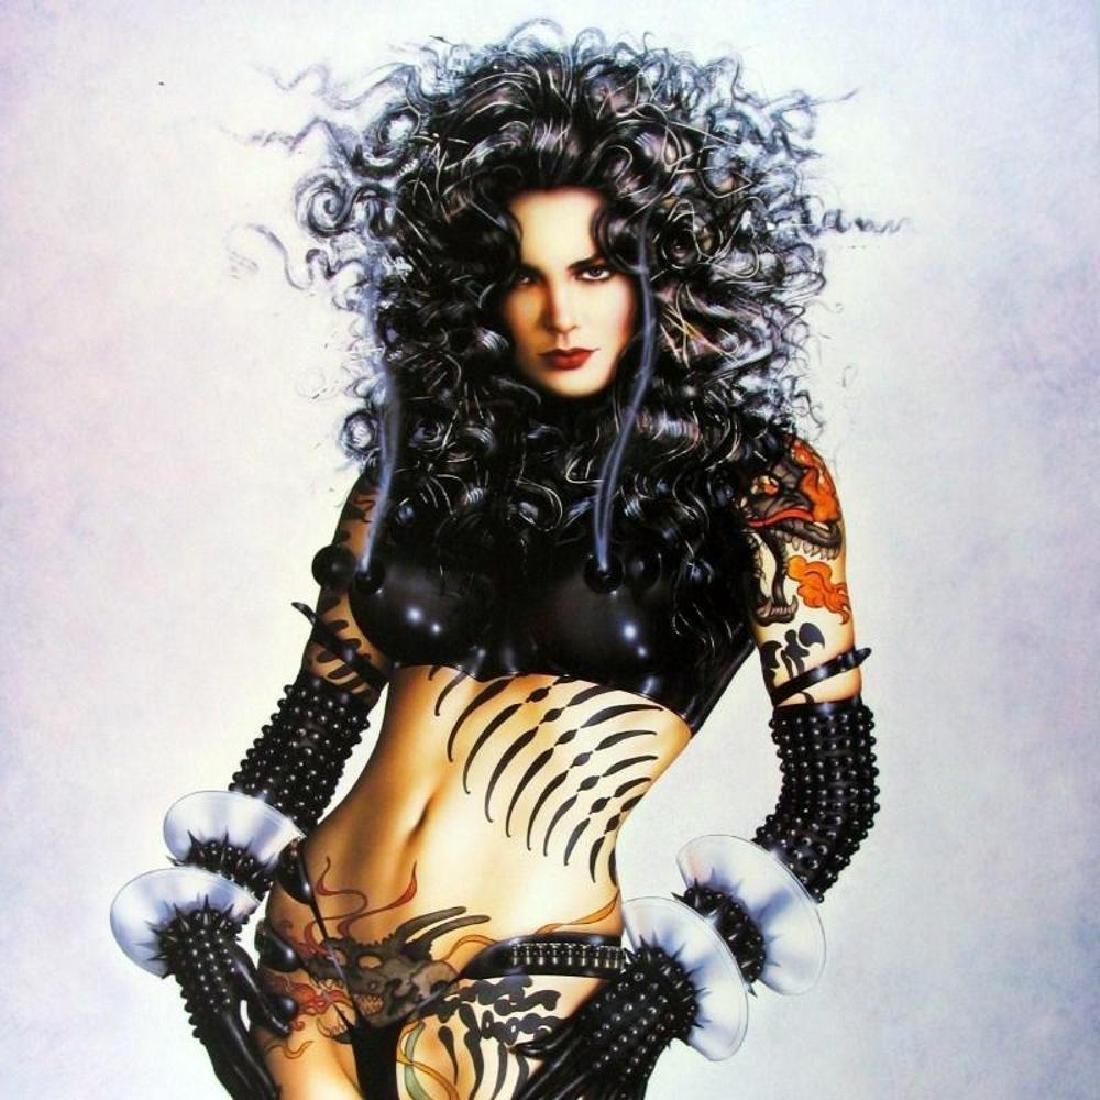 Olivia Pin Up Print Erotic Nude Large Dealer - 3